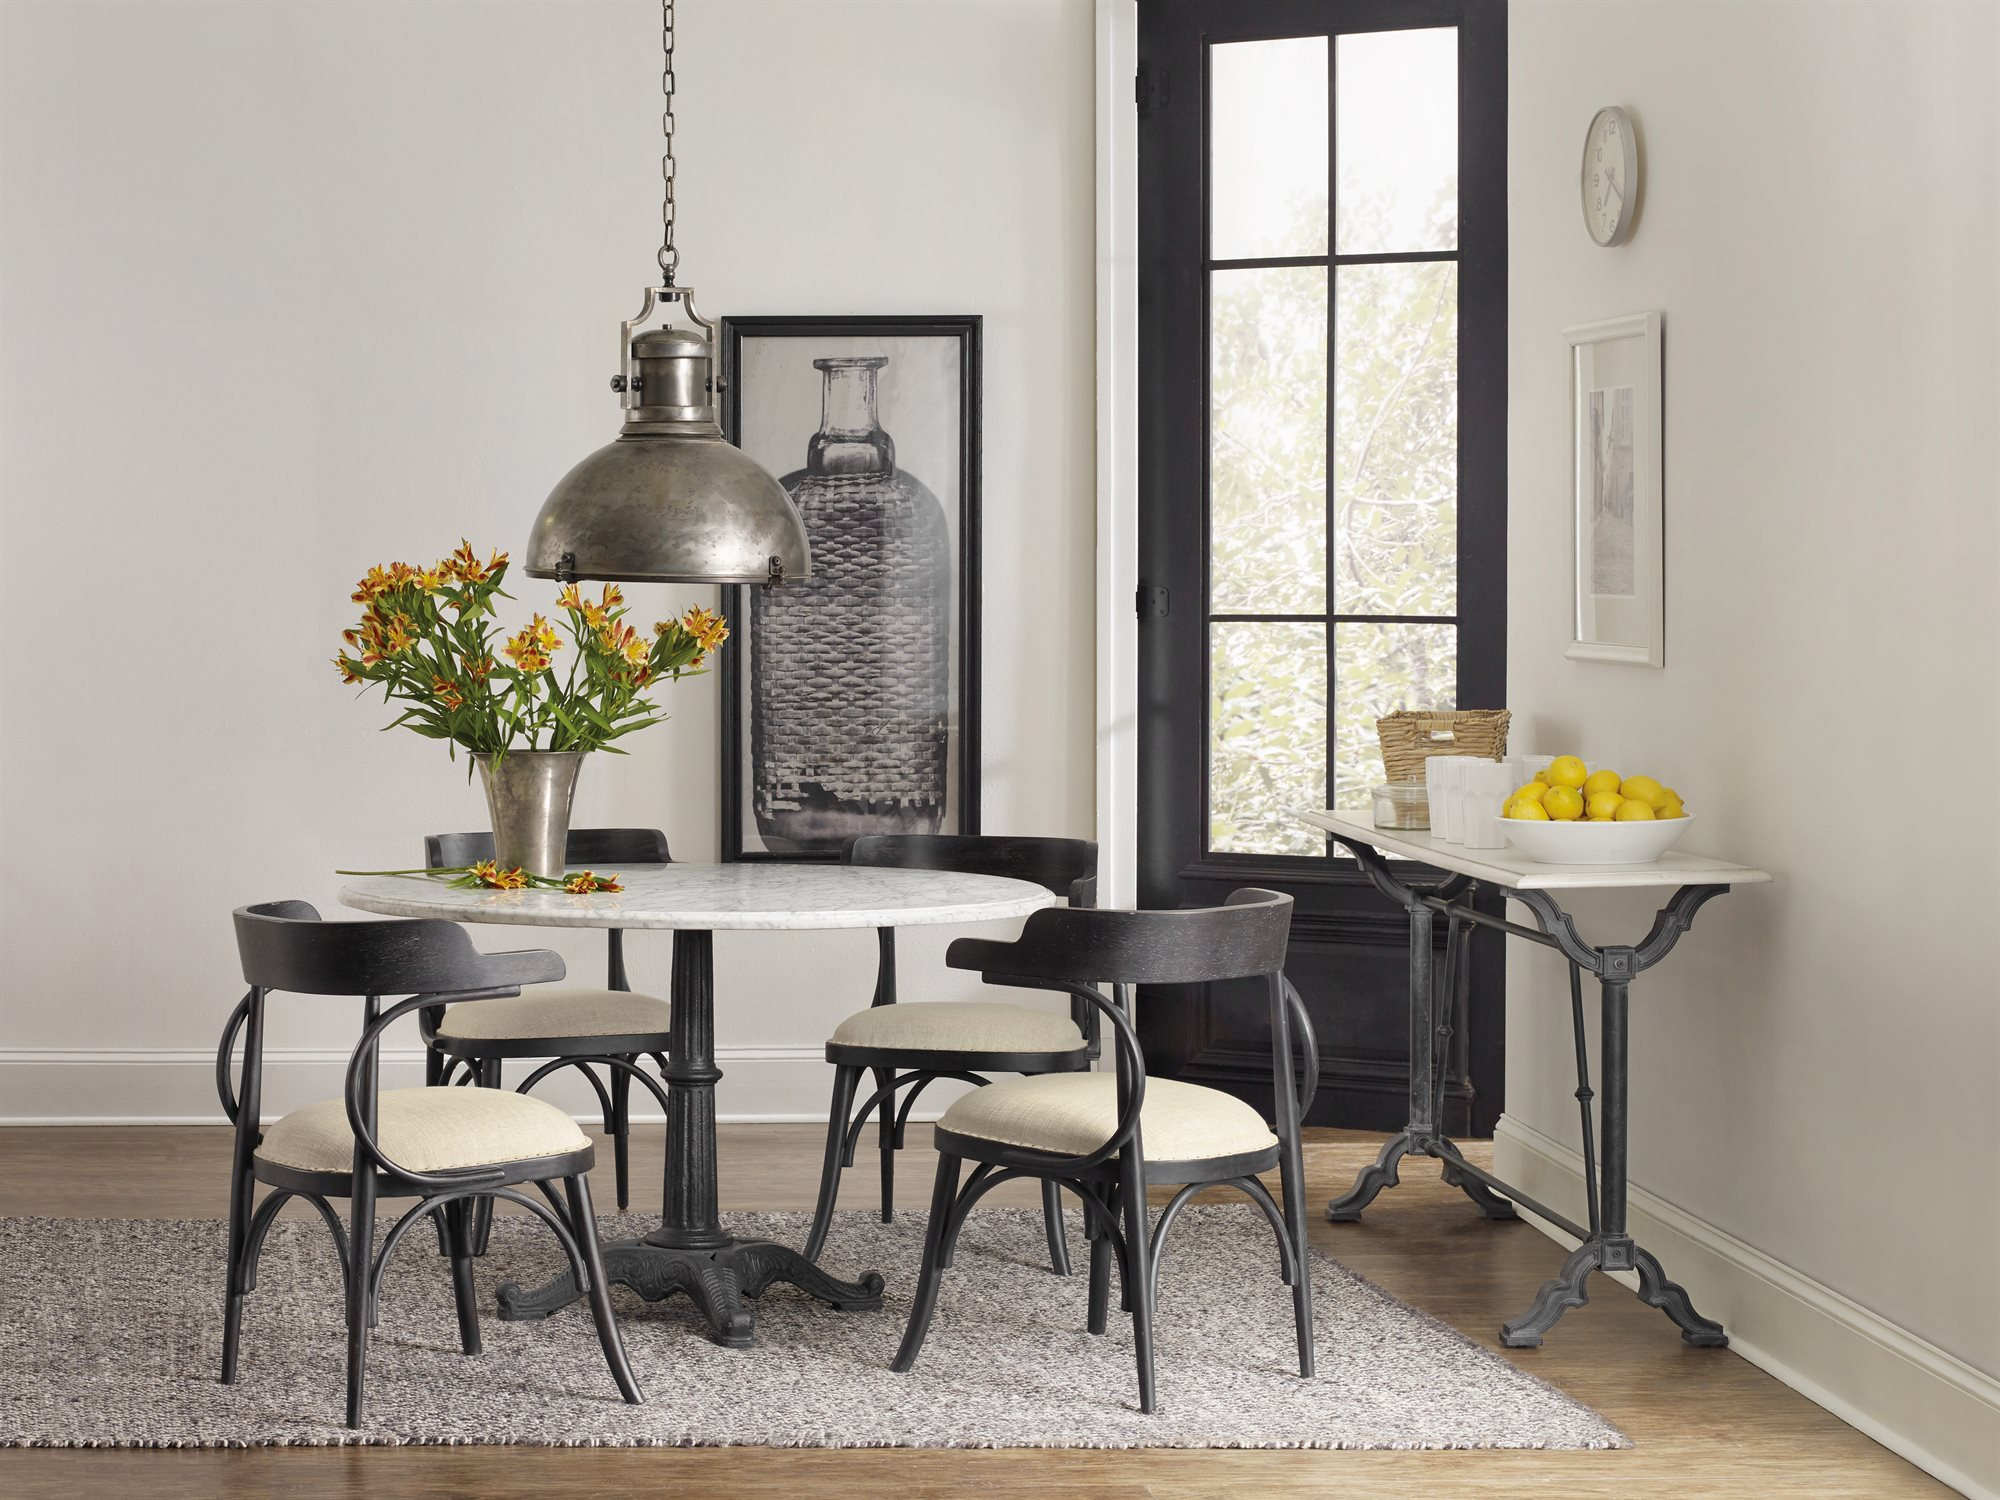 Hooker Furniture Studio 7h Dining Room Set Hoo546575203whset